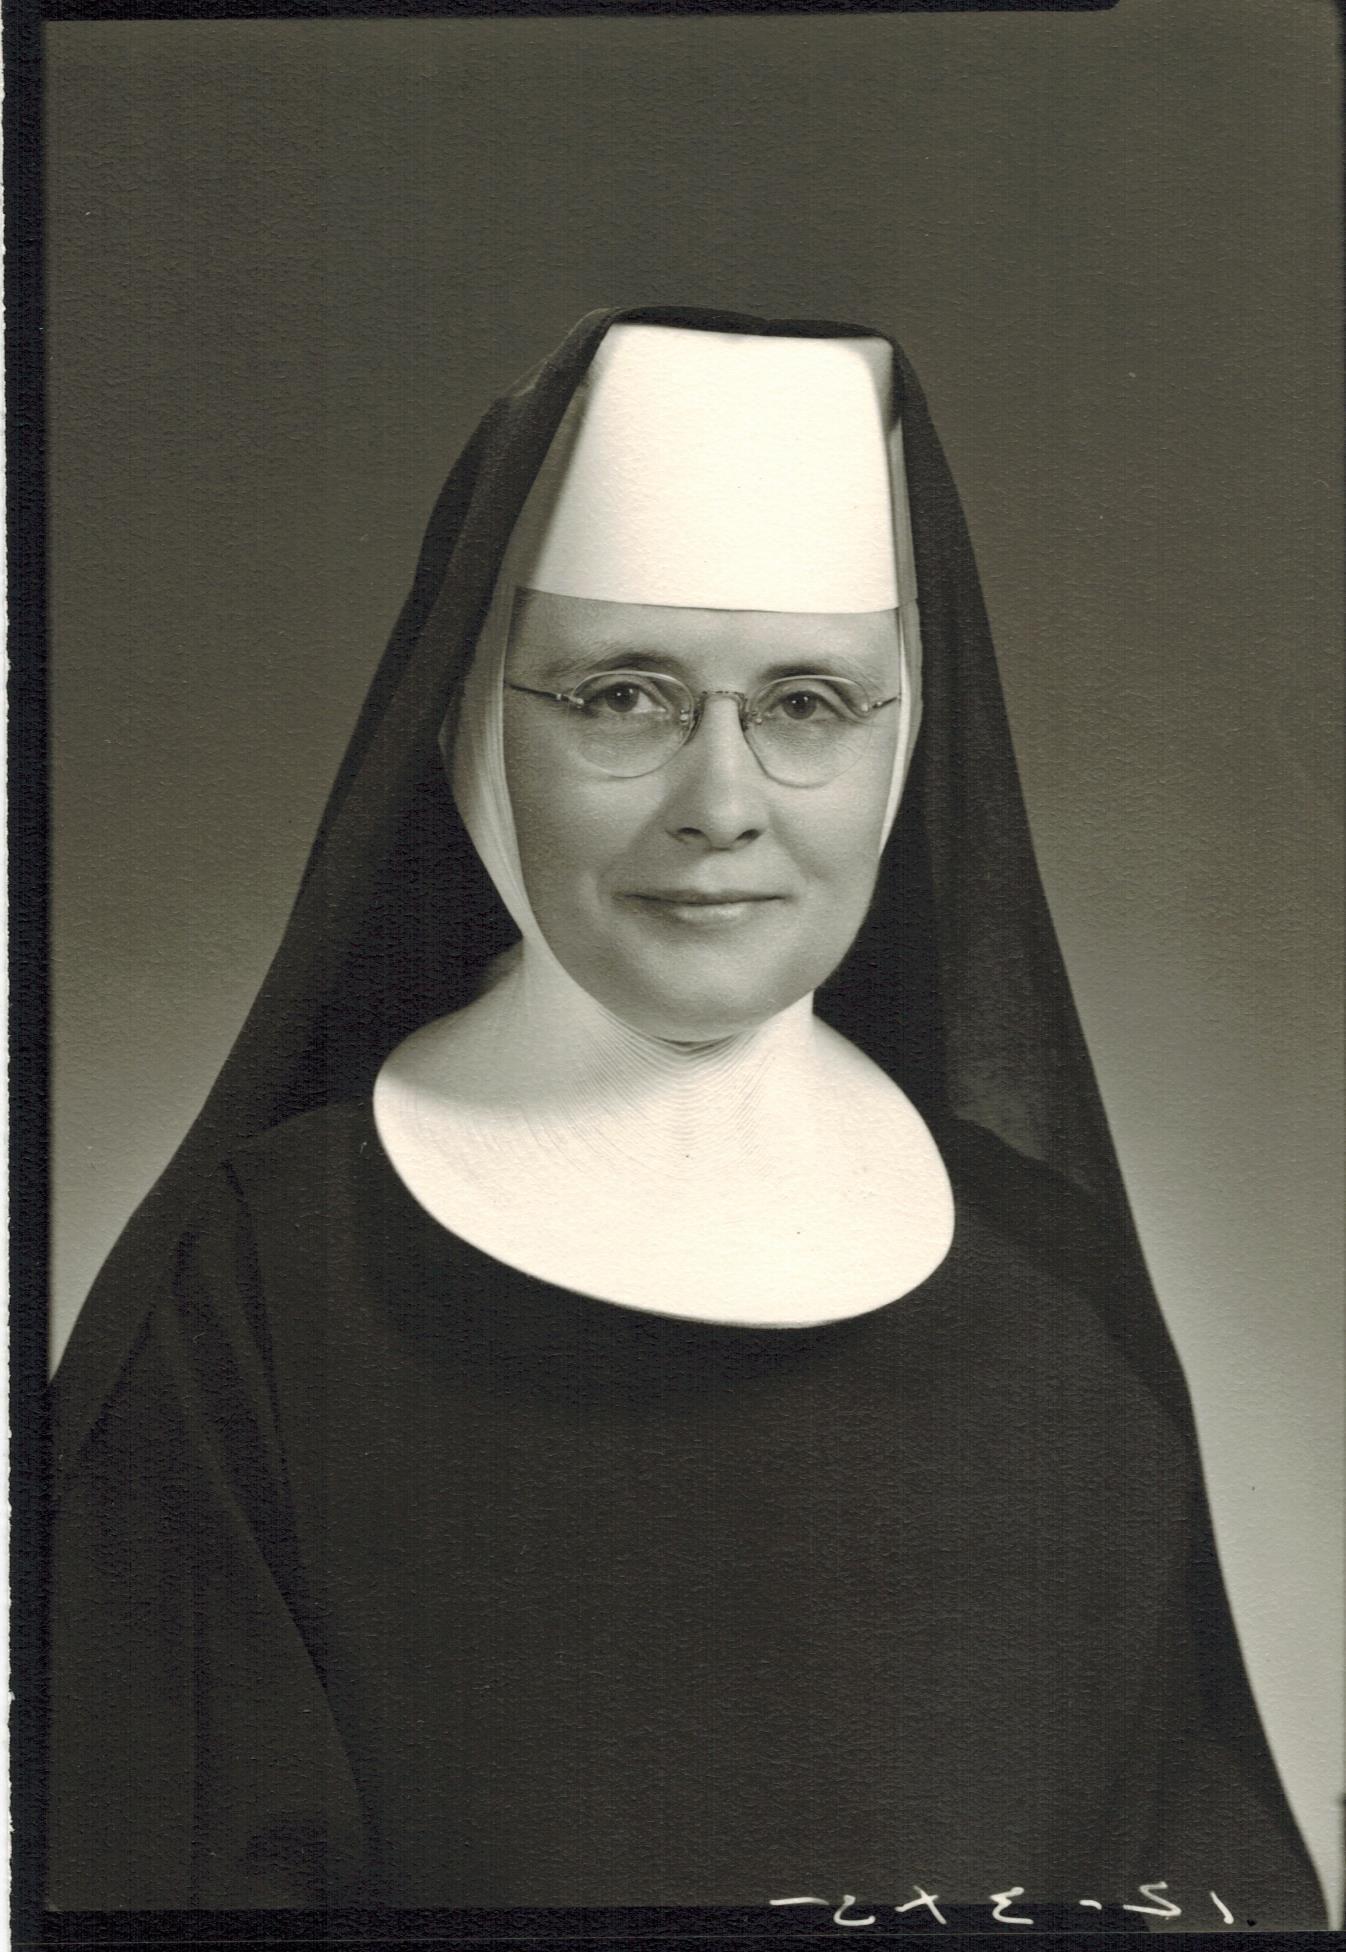 In Loving Memory of Sister Edane Volk, OSB - December 21, 2009